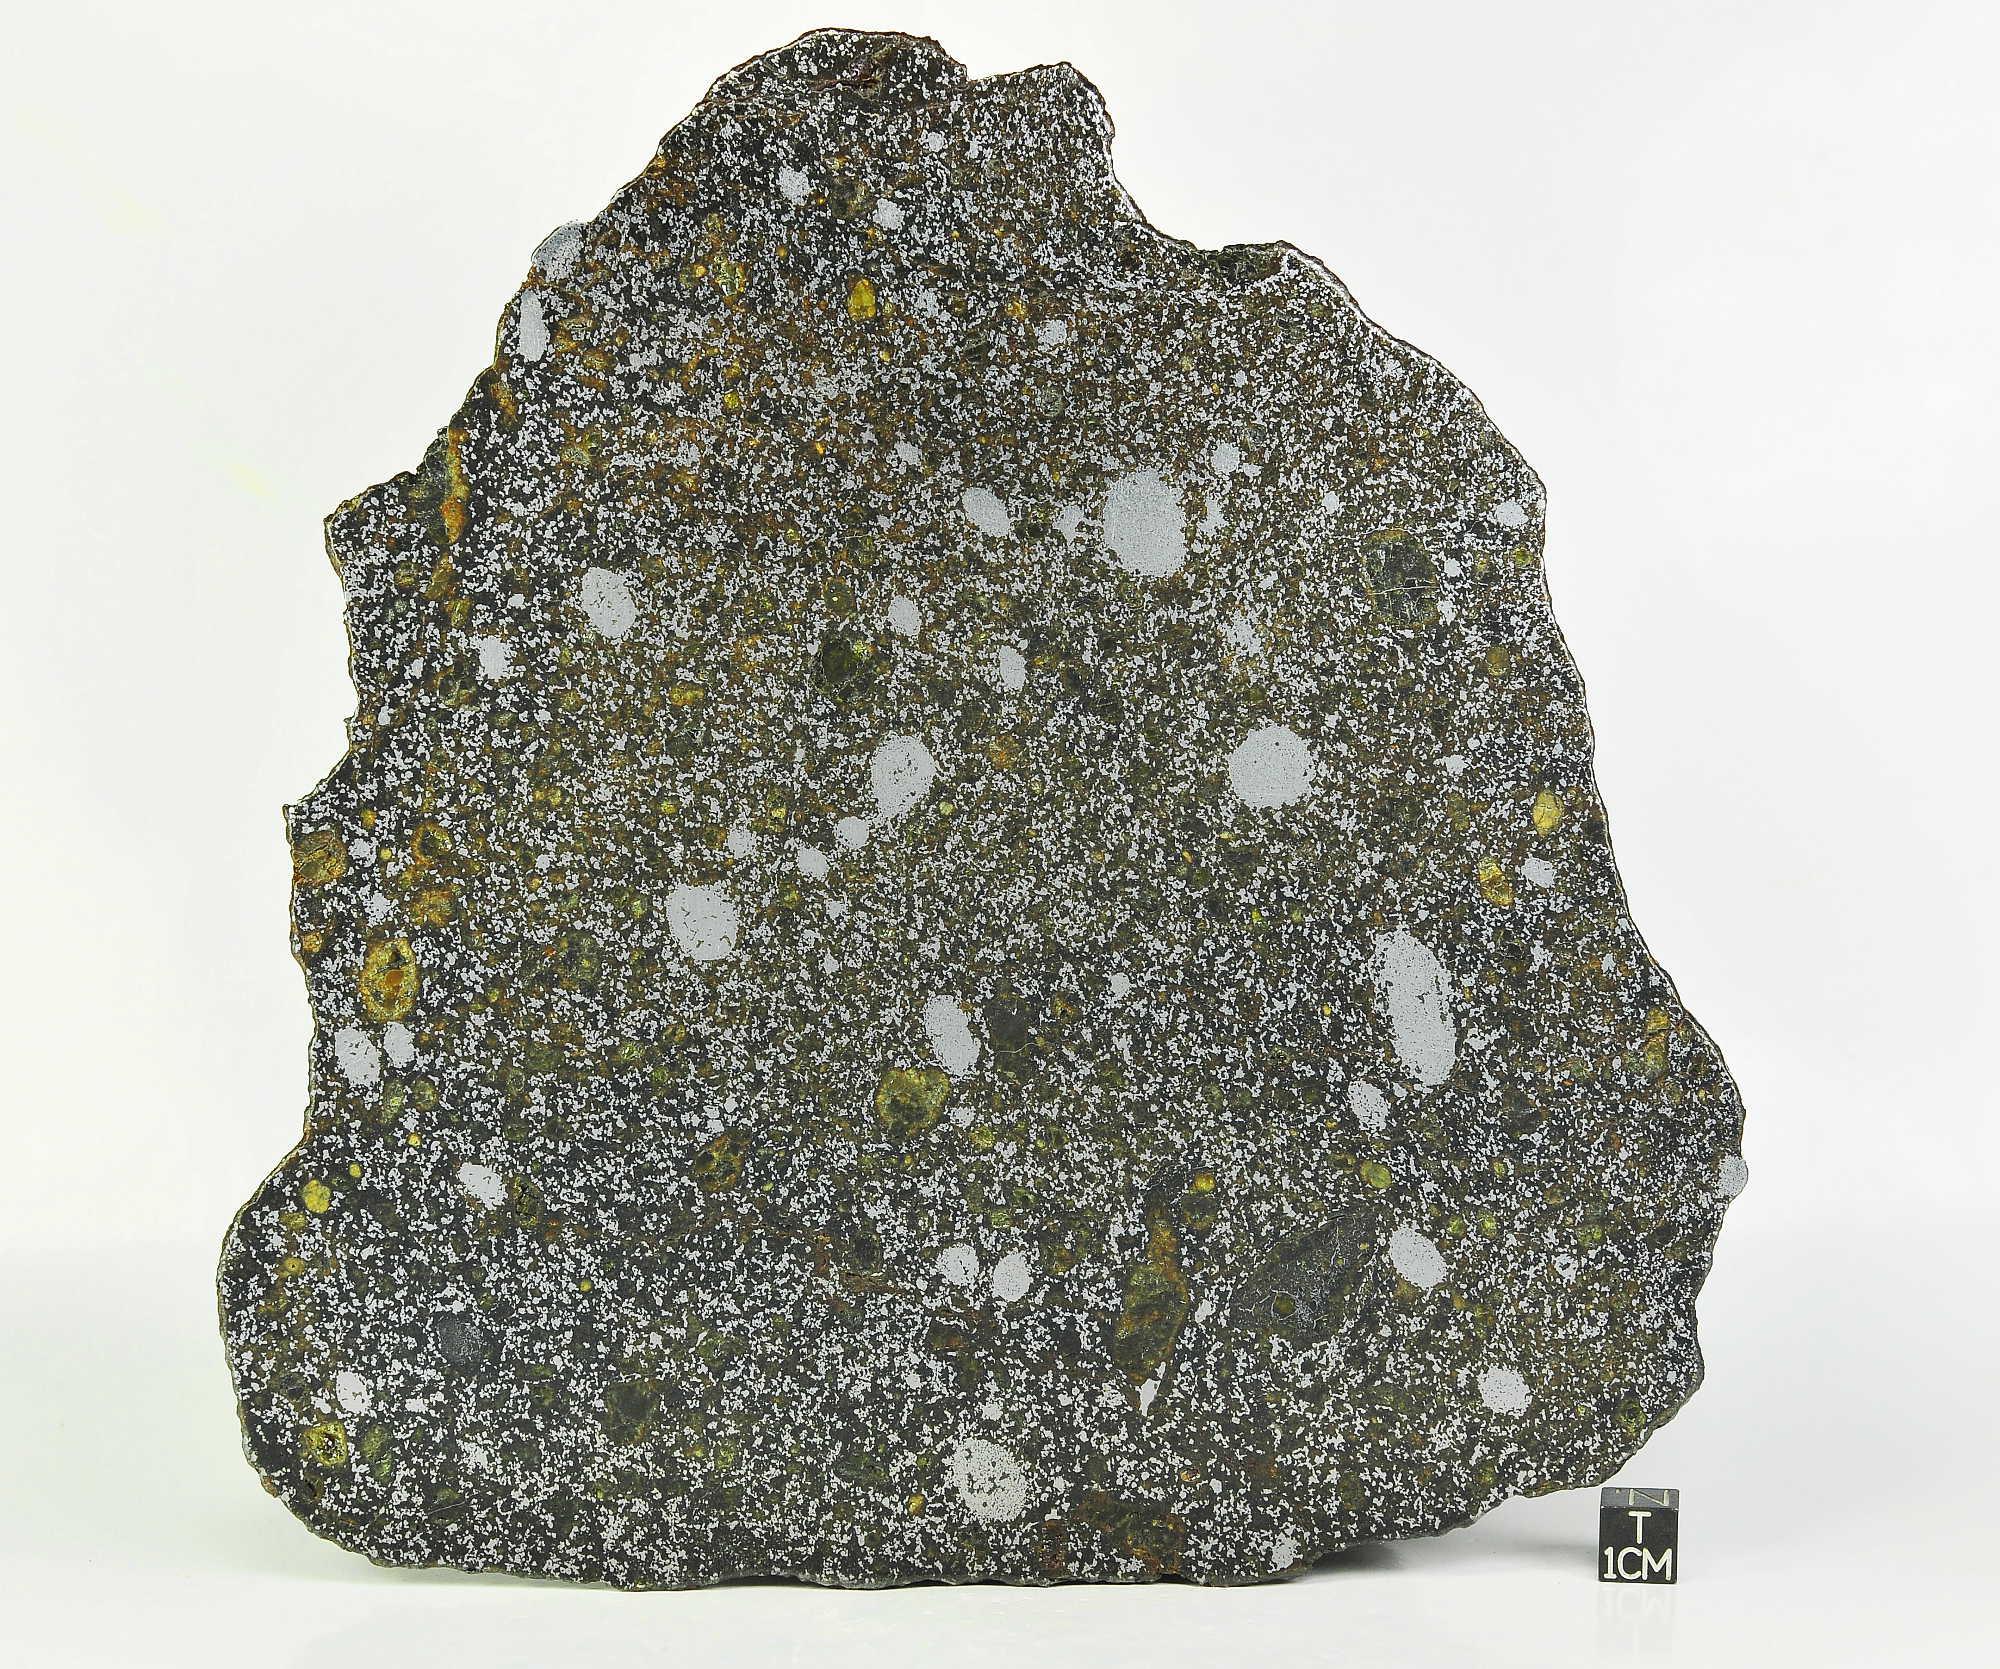 NWA 8741 Mesosiderite 338g full slice